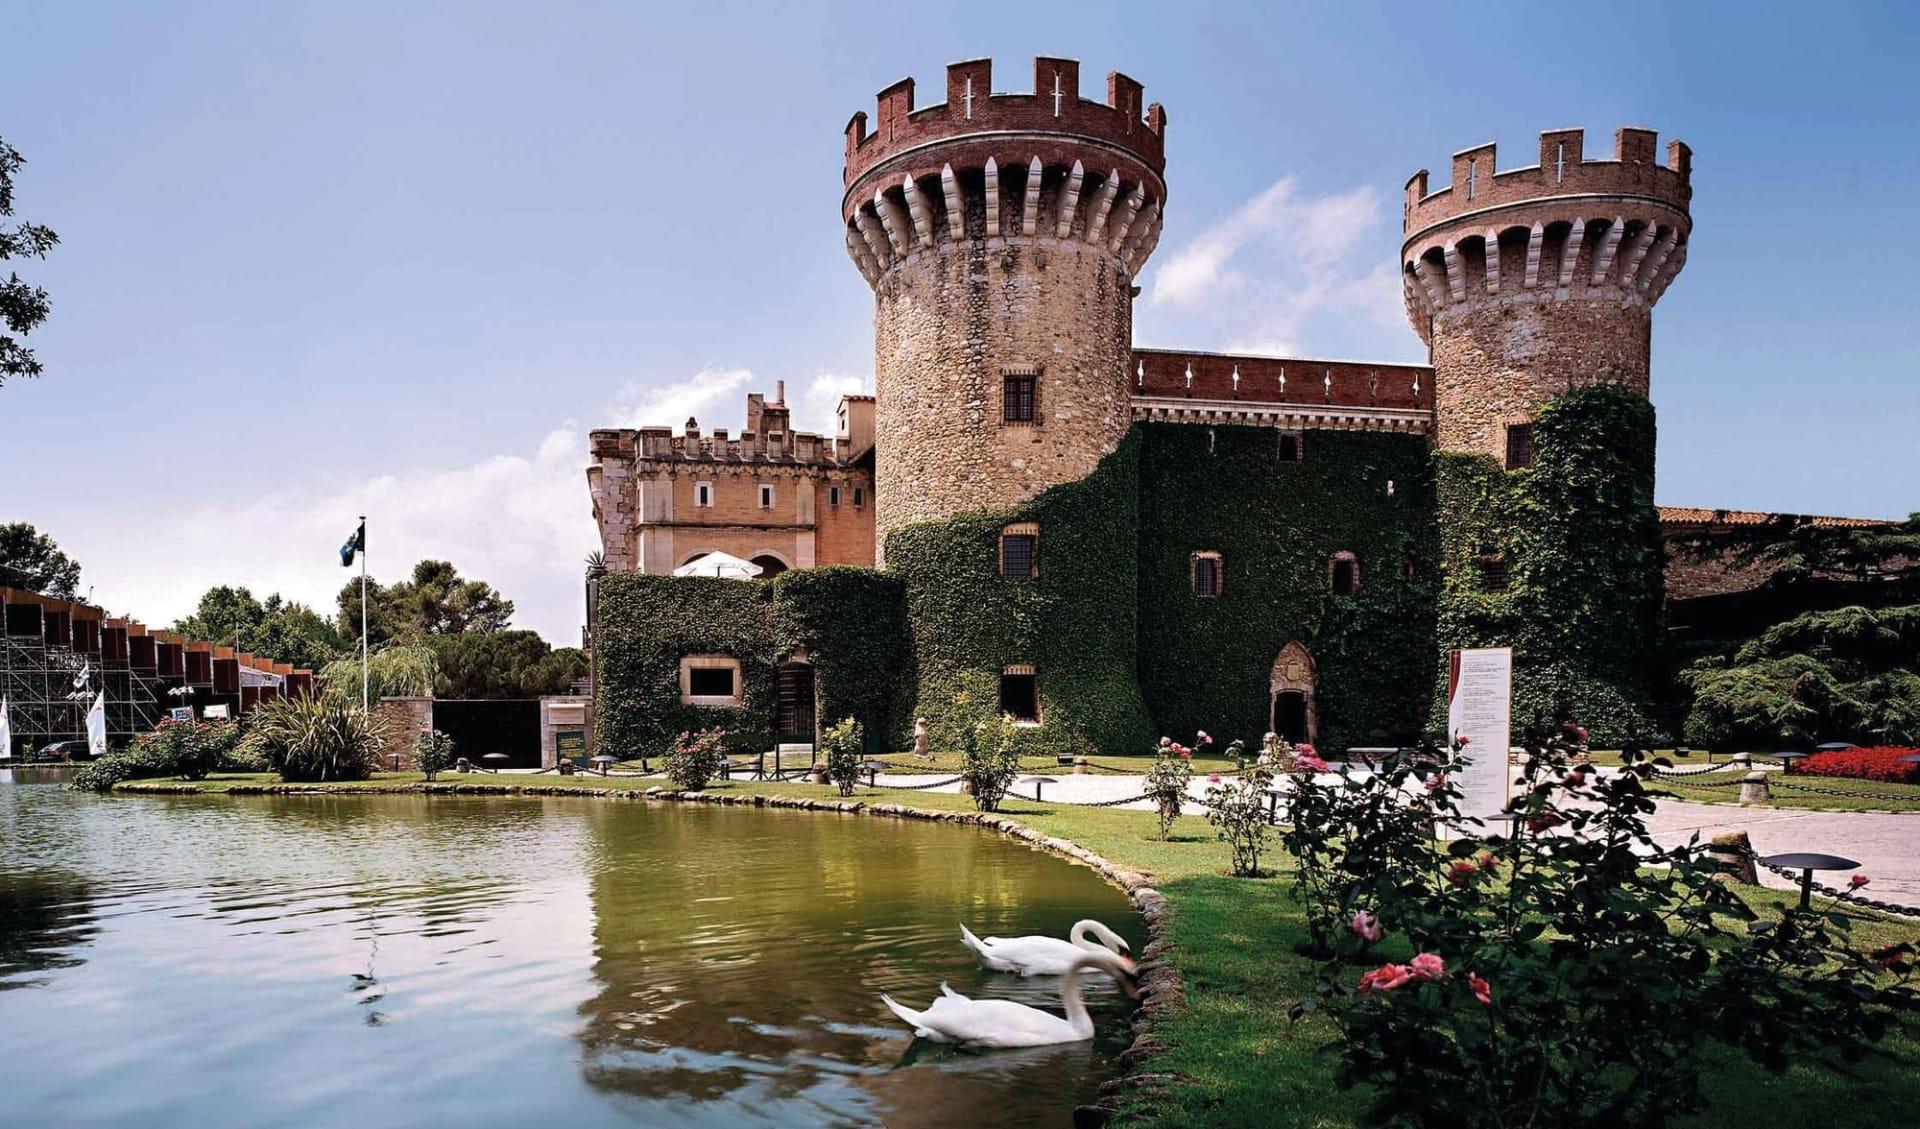 16.10. - 23.10.2021 Golf Trainingswoche an der Costa Brava ab Barcelona: Castillo_Perelada